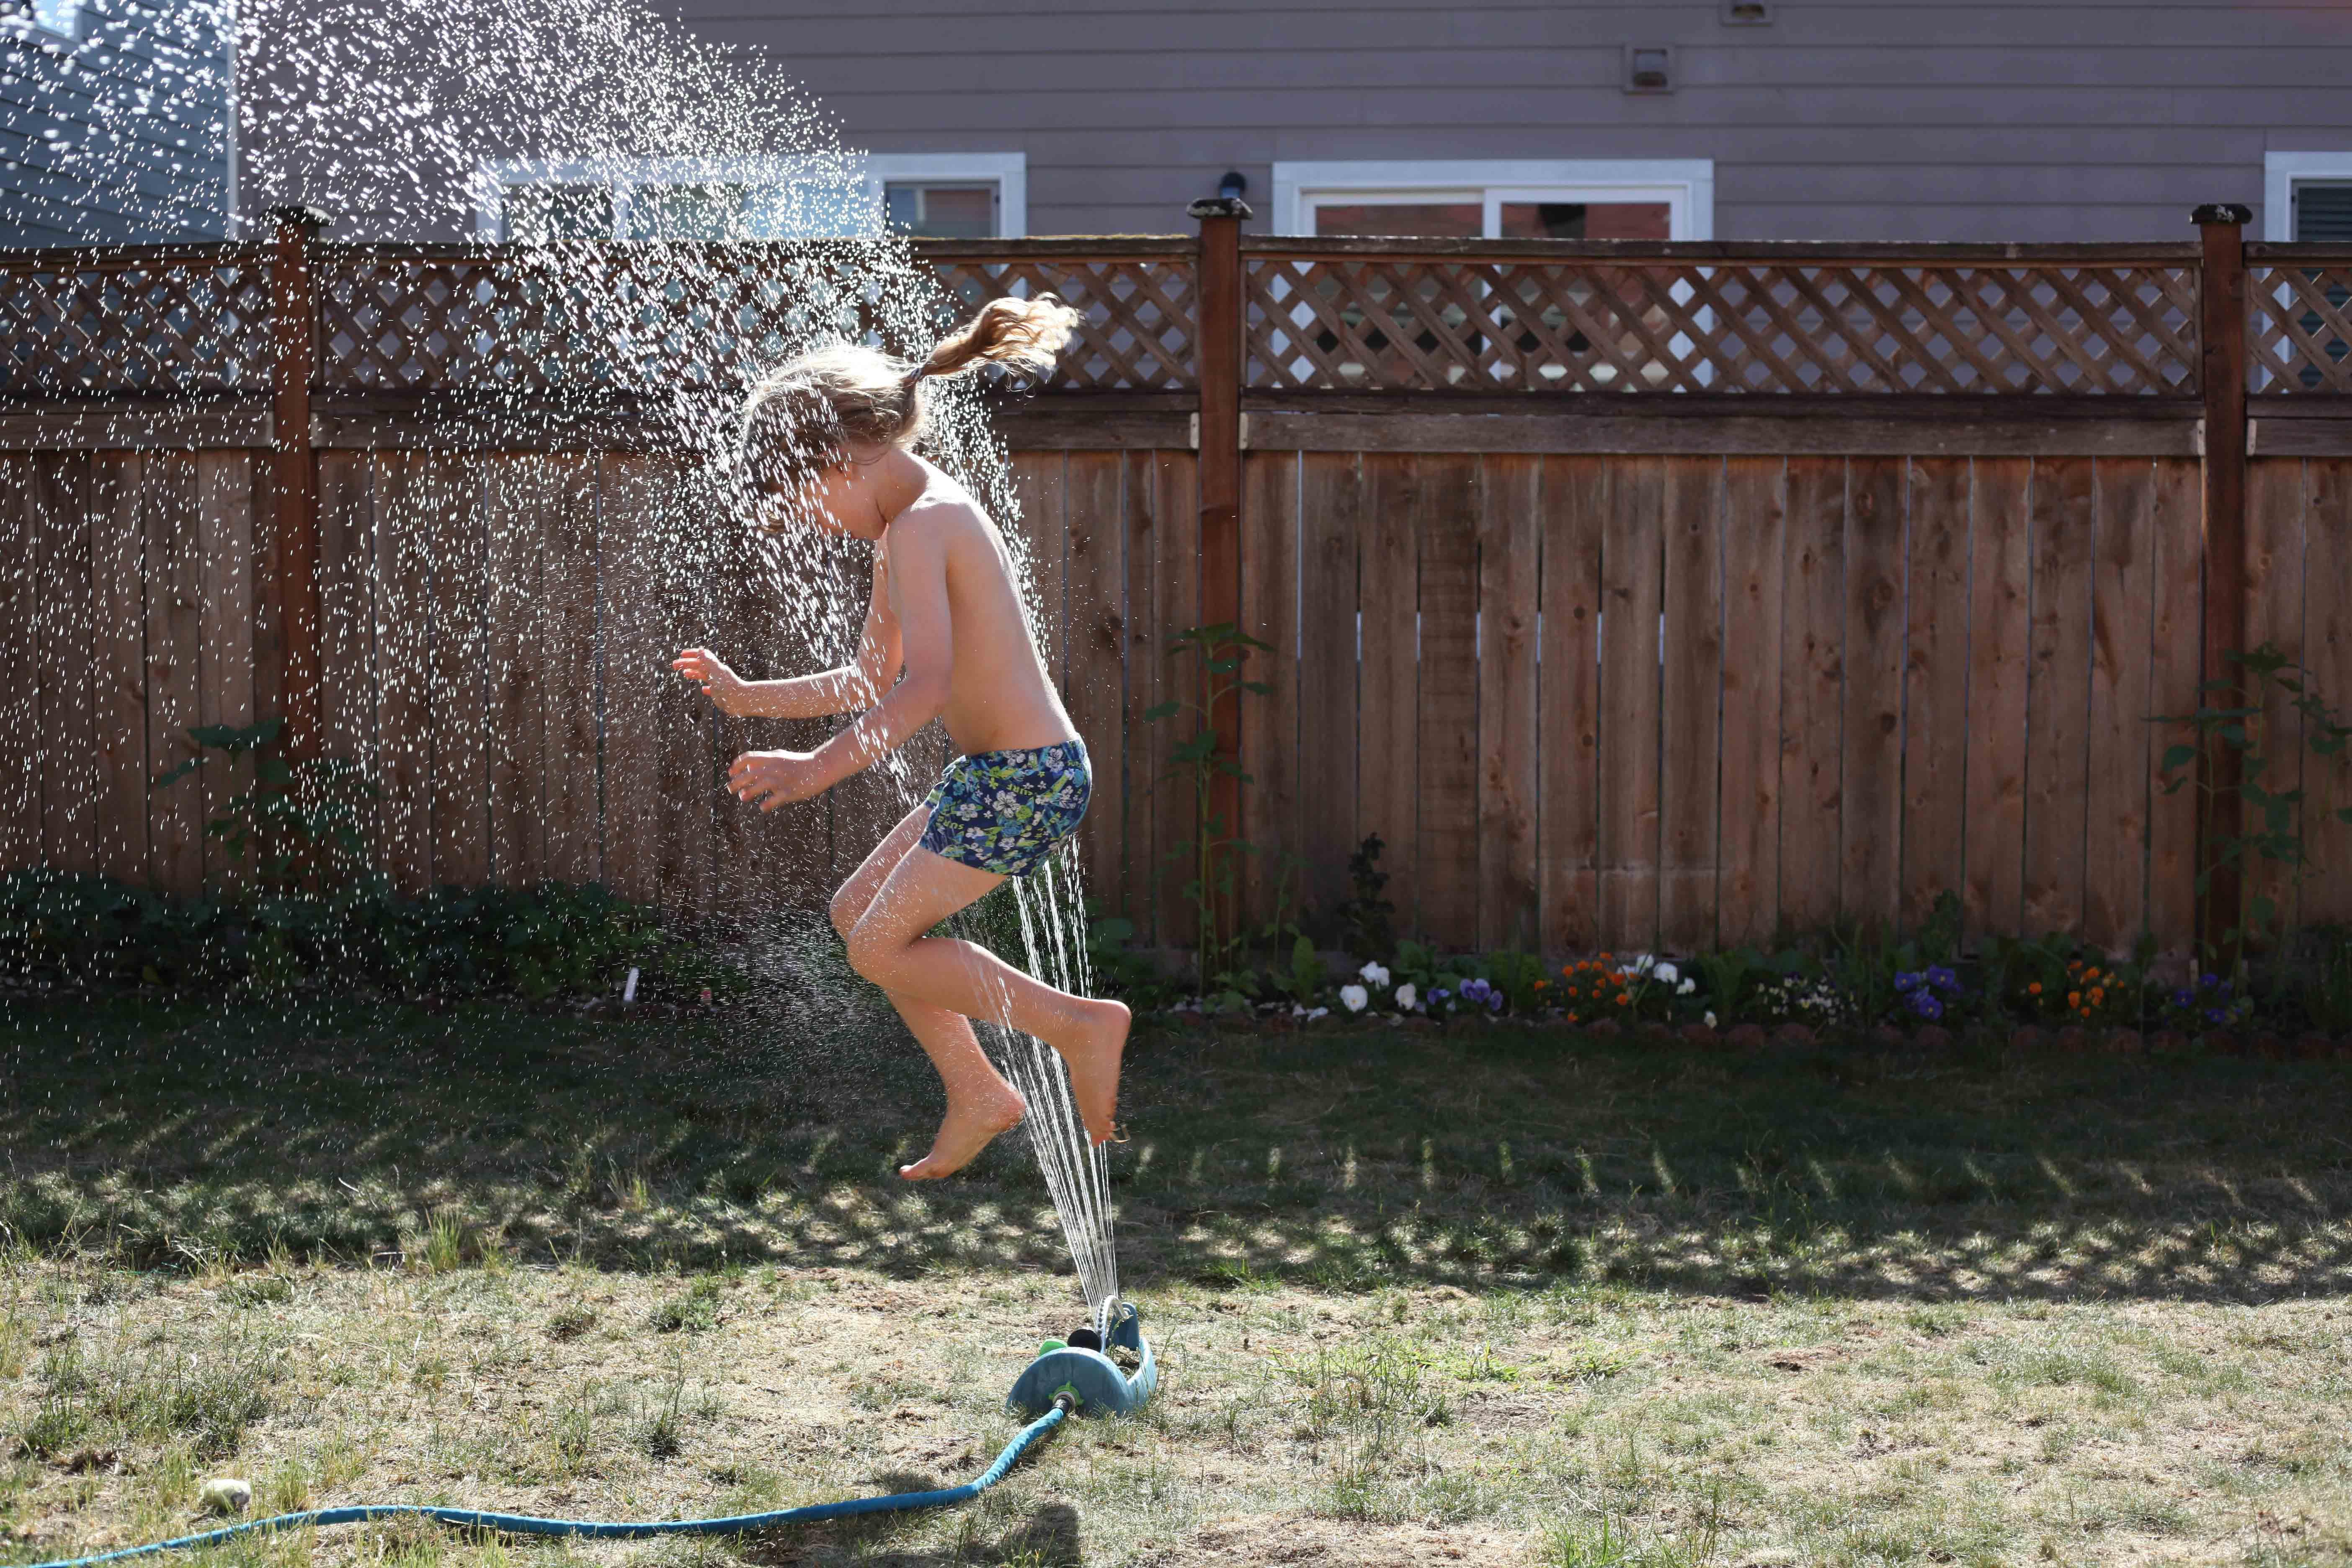 Backyard sprinkler action shot by Johan Bos via Pexels. #backyardfun #sprinkler #summer | https://www.roseclearfield.com